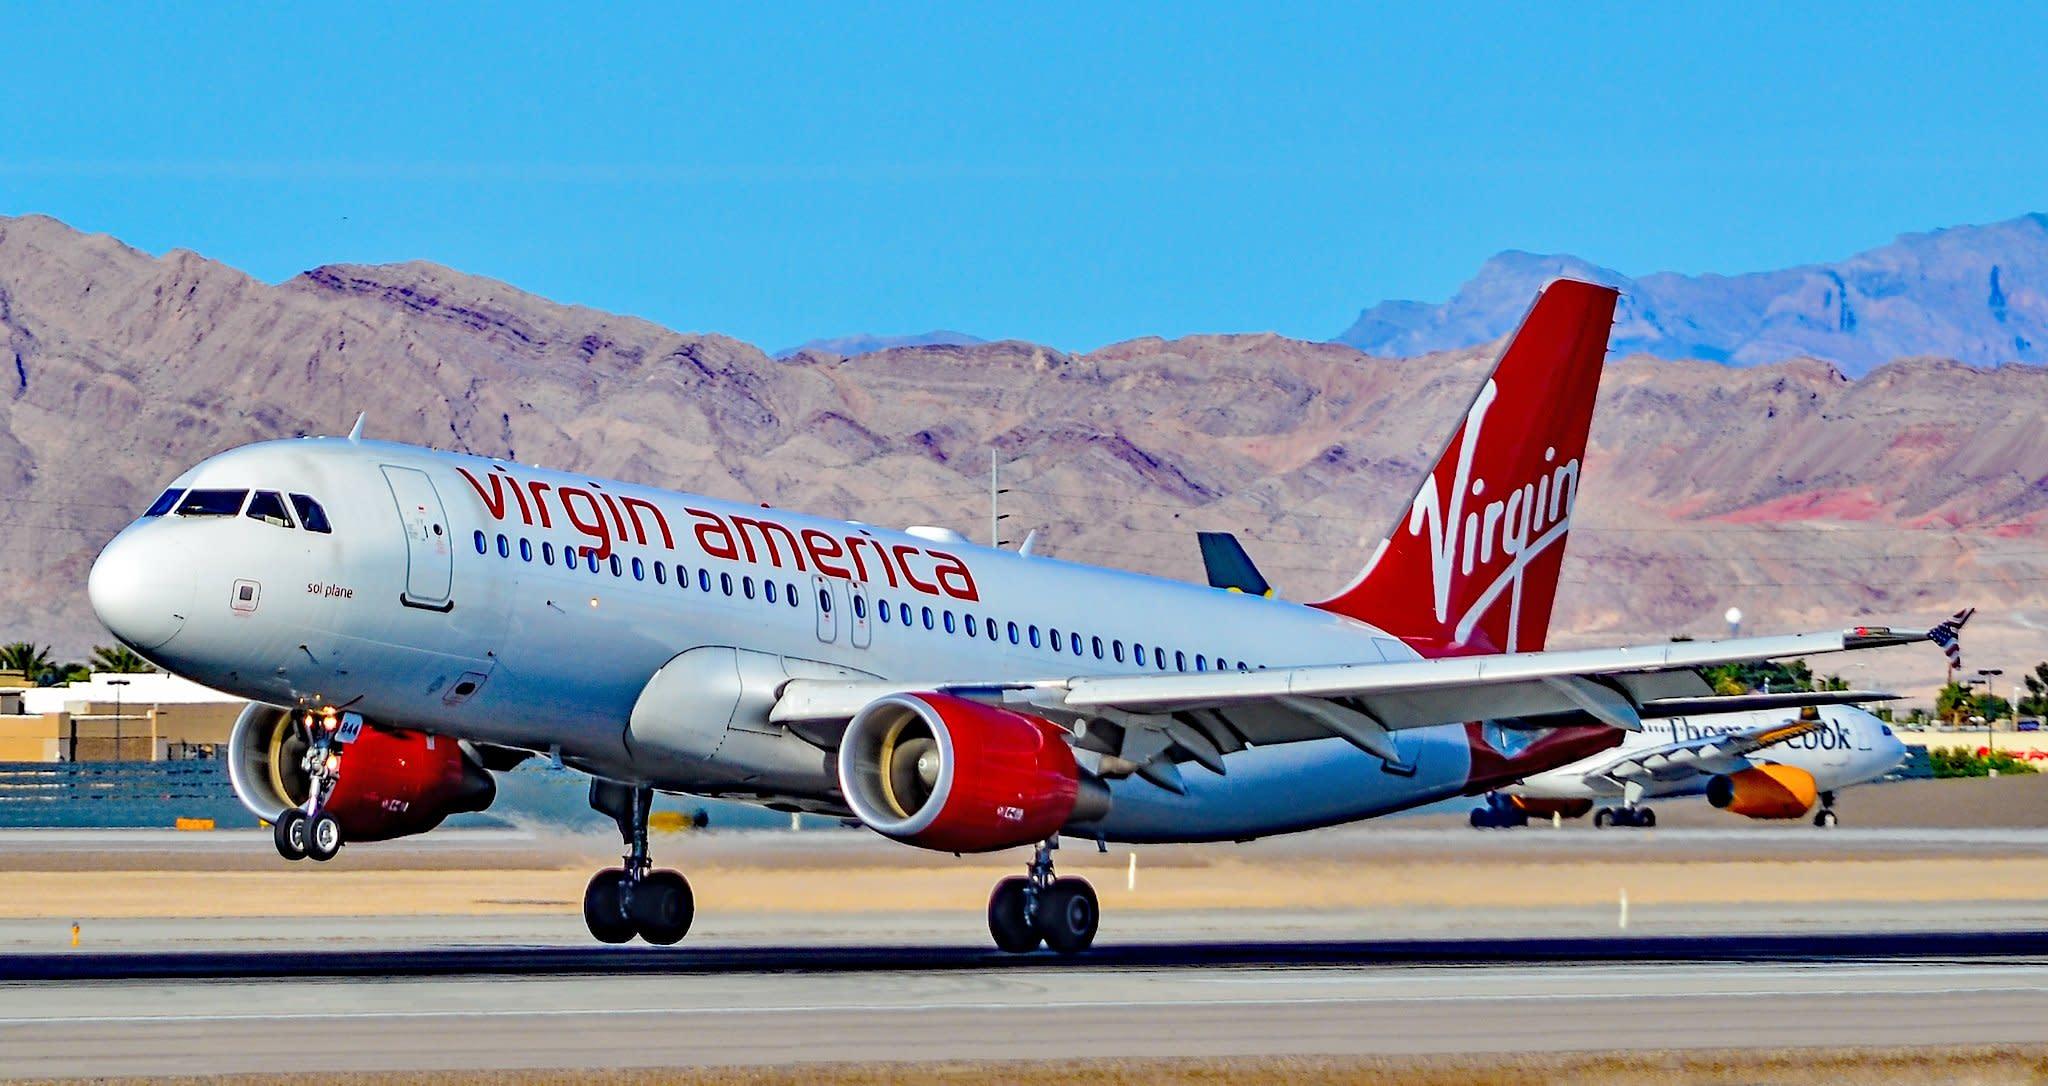 Virgin America Flies Final Flight